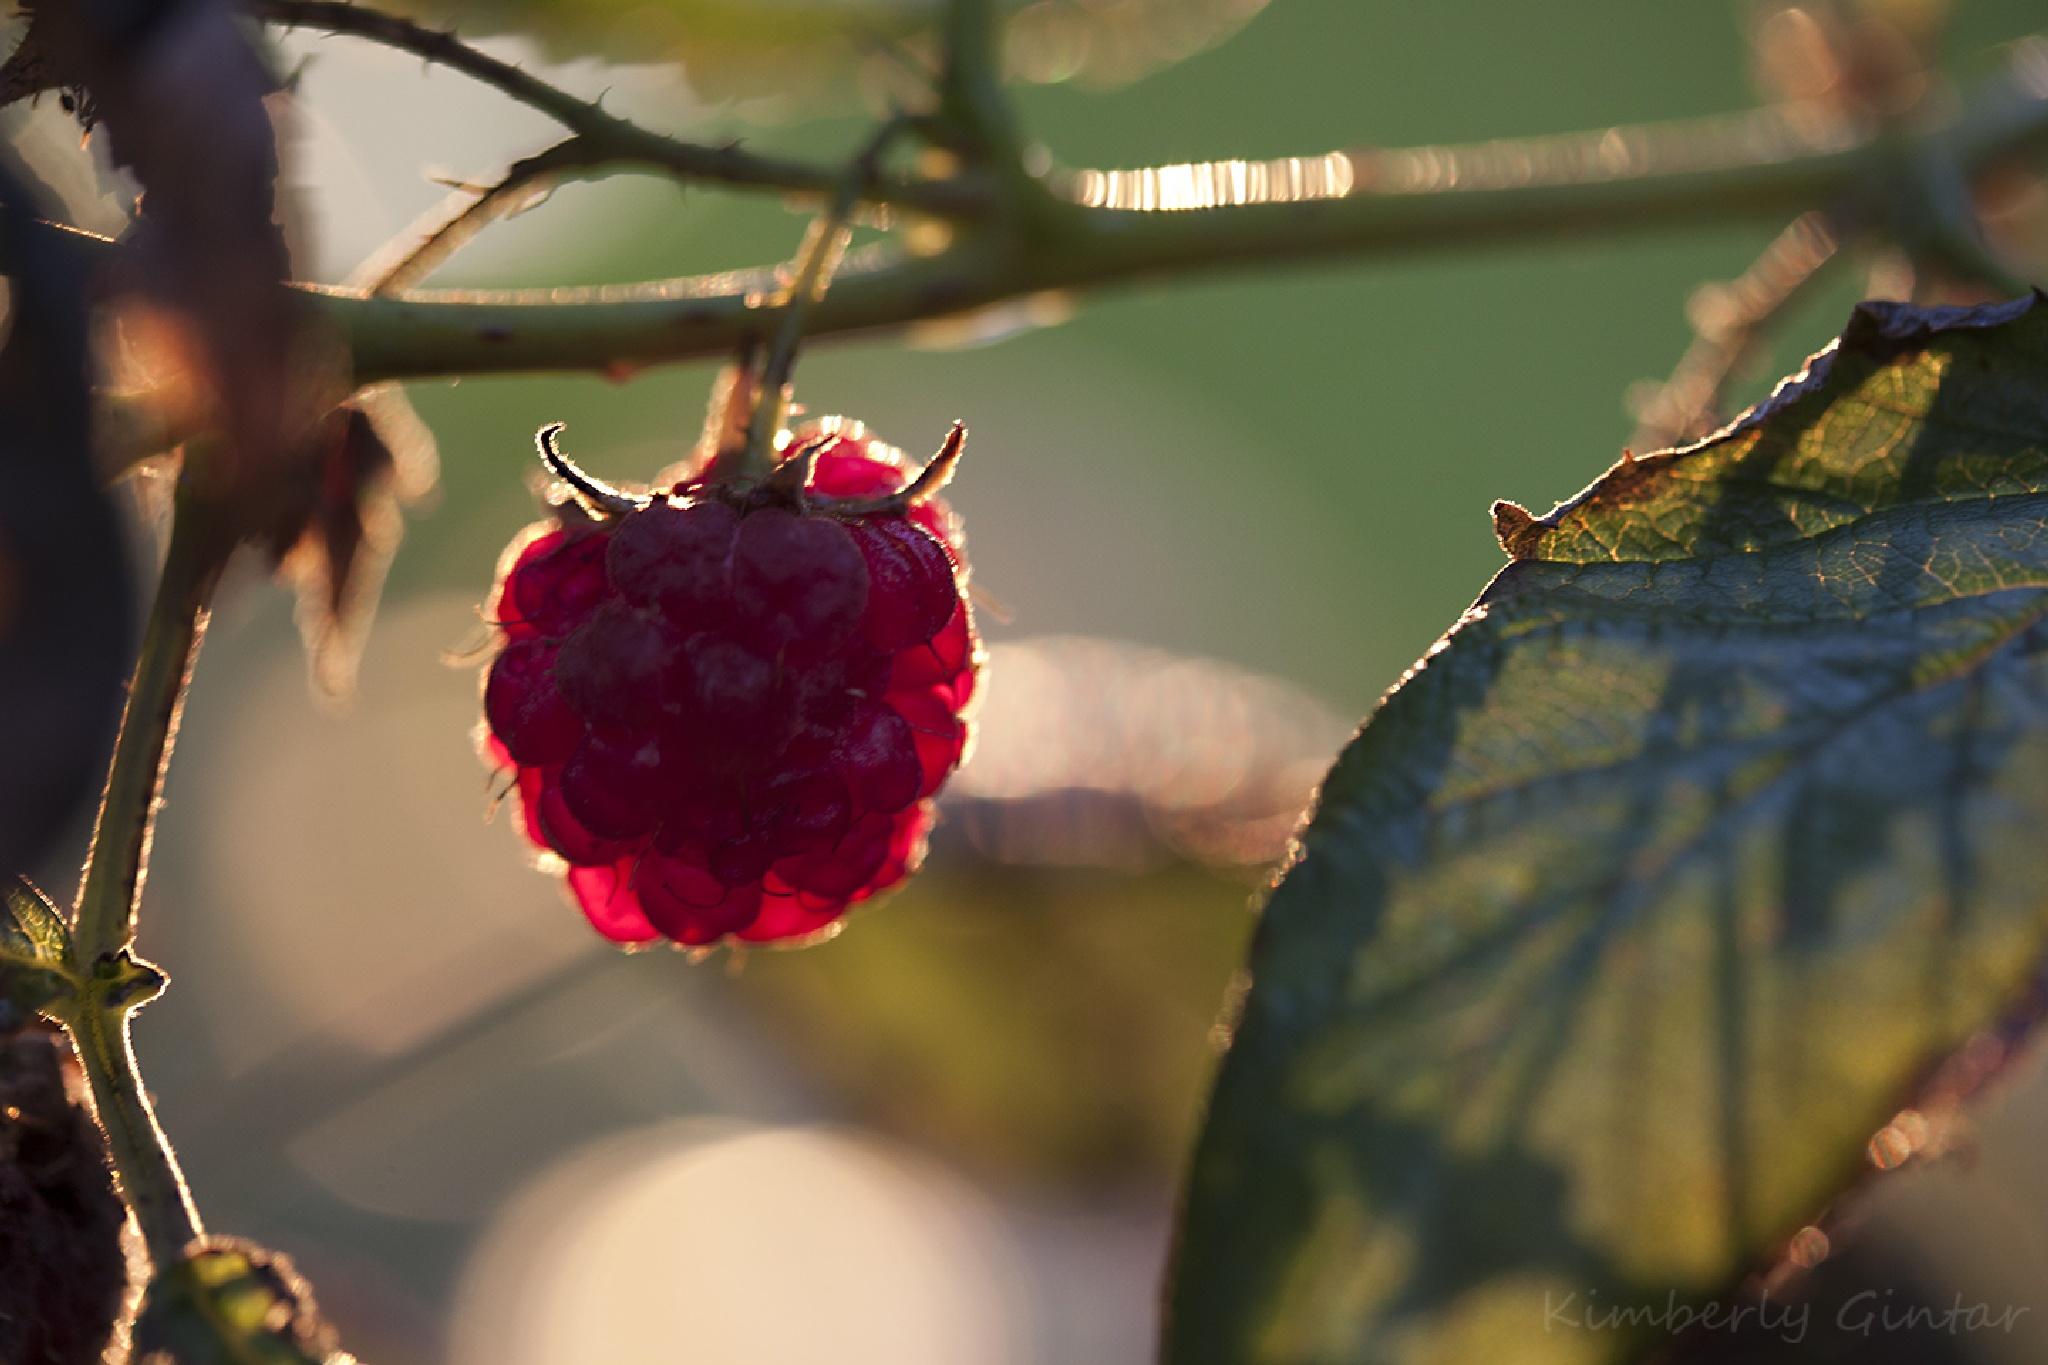 Raspberry by KimberlyGintar